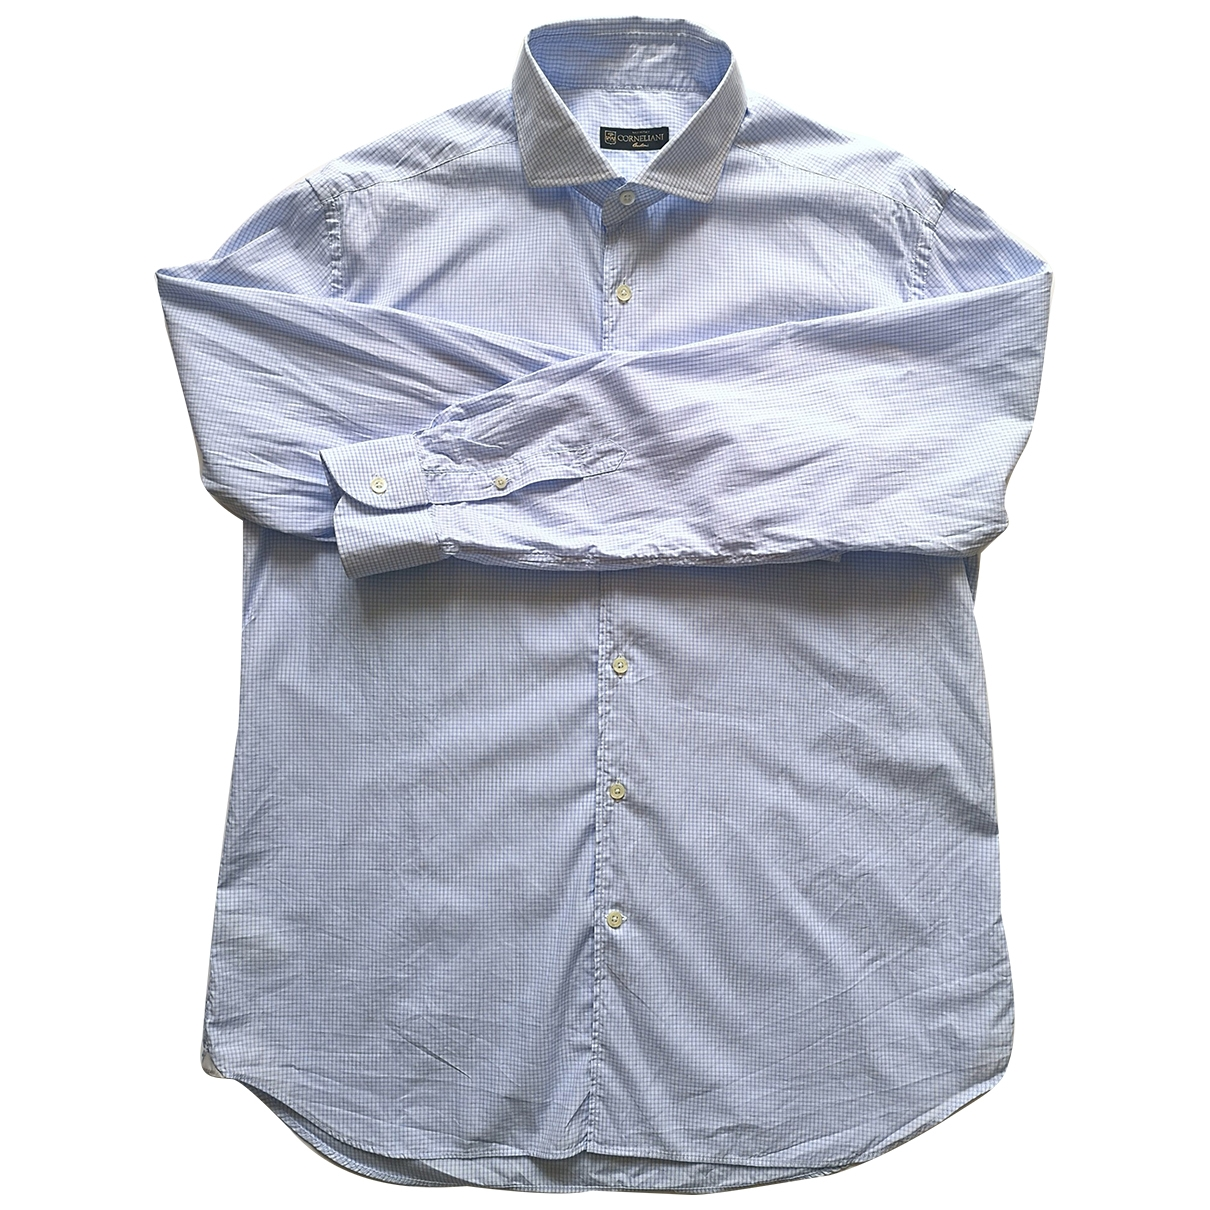 Corneliani \N Hemden in  Blau Baumwolle